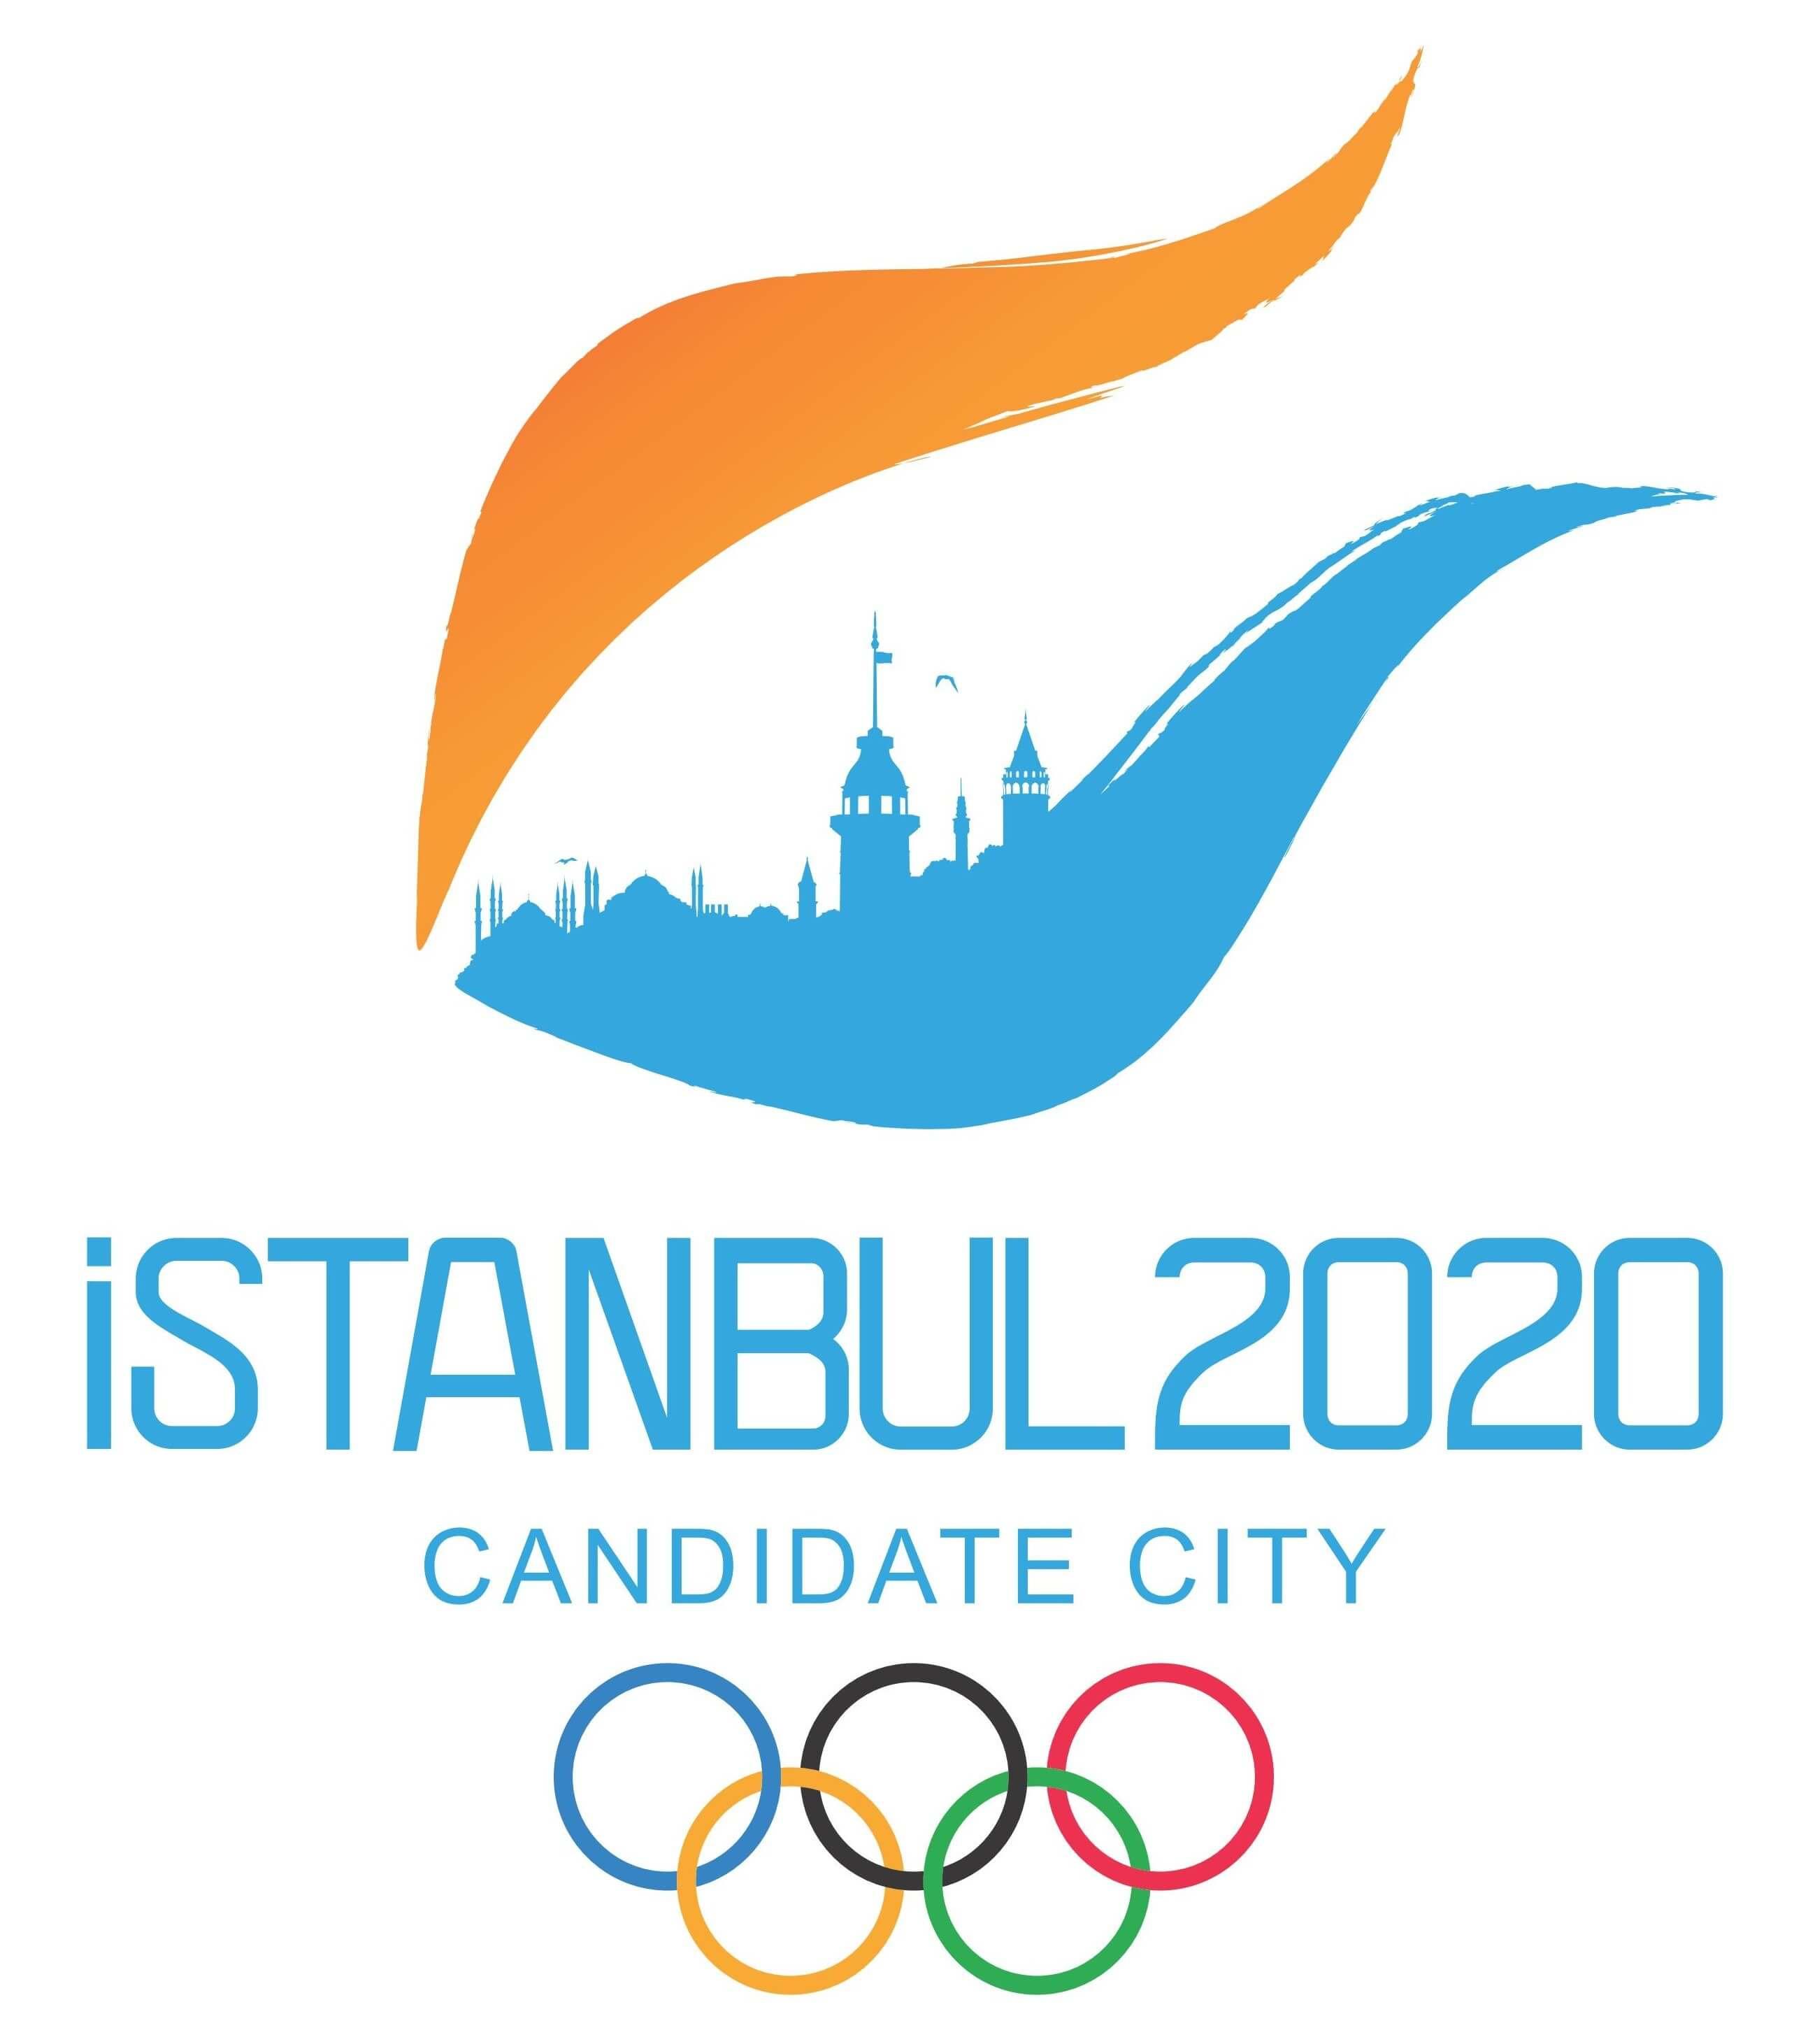 istanbul-2020-candidate-city-logo